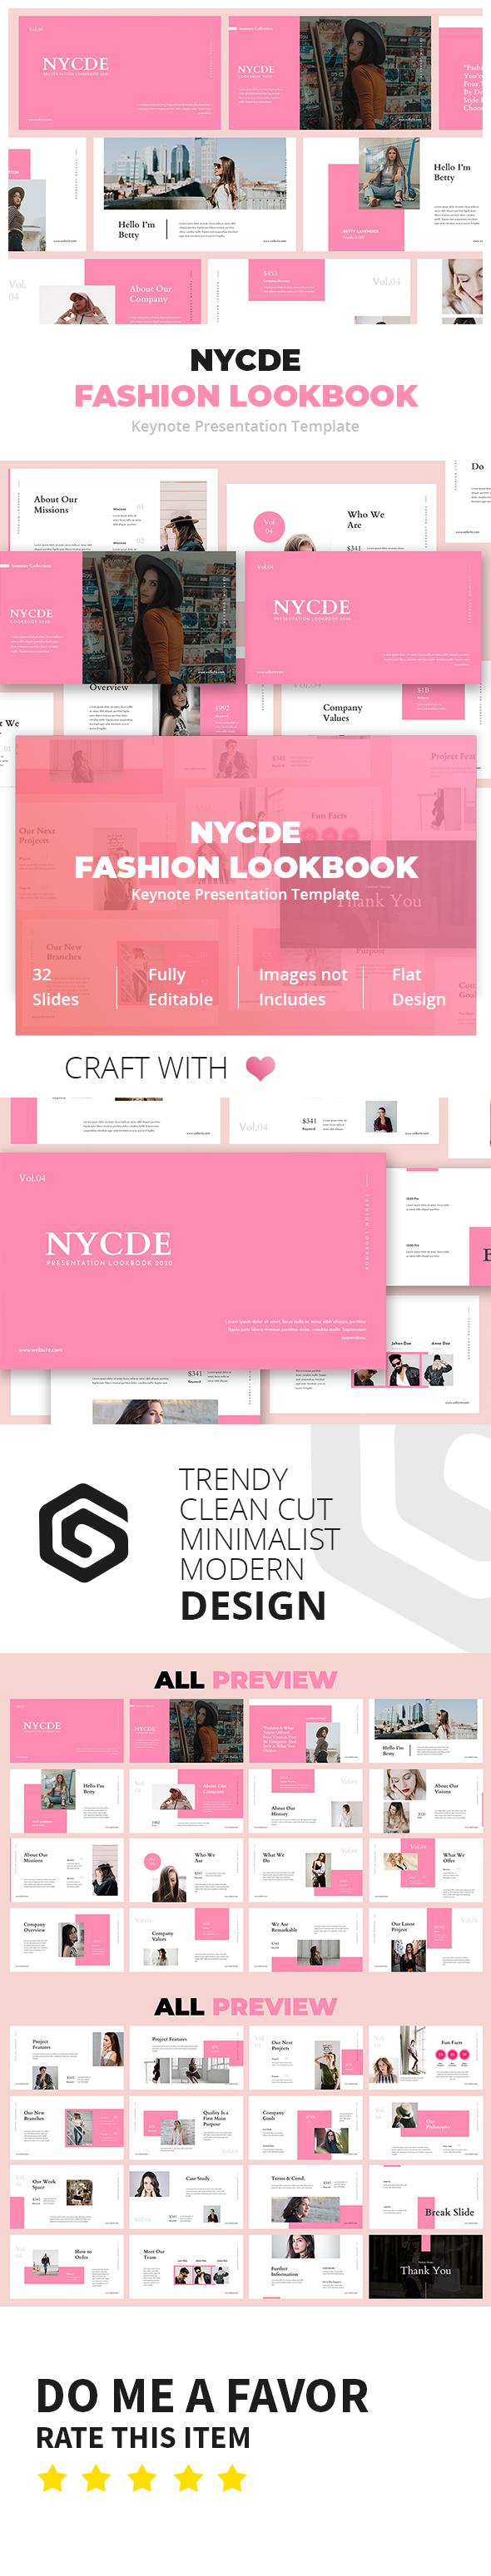 Nycde Fashion Lookbook Keynote